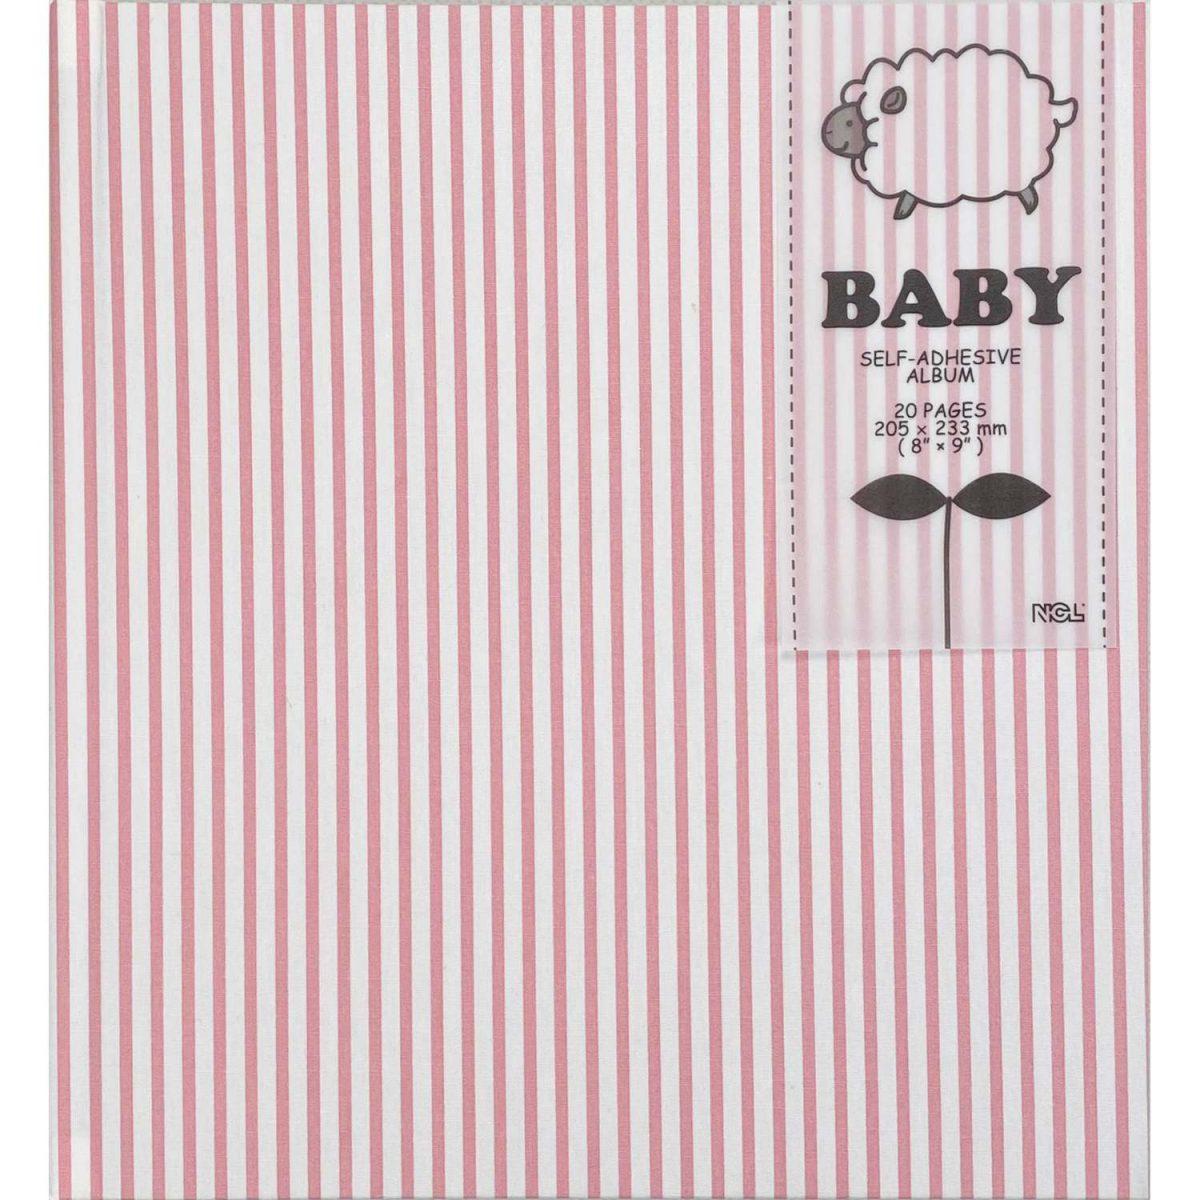 NCL Self-Adhesive Glue-Bound Baby Photo Album / Photo Book -Demi